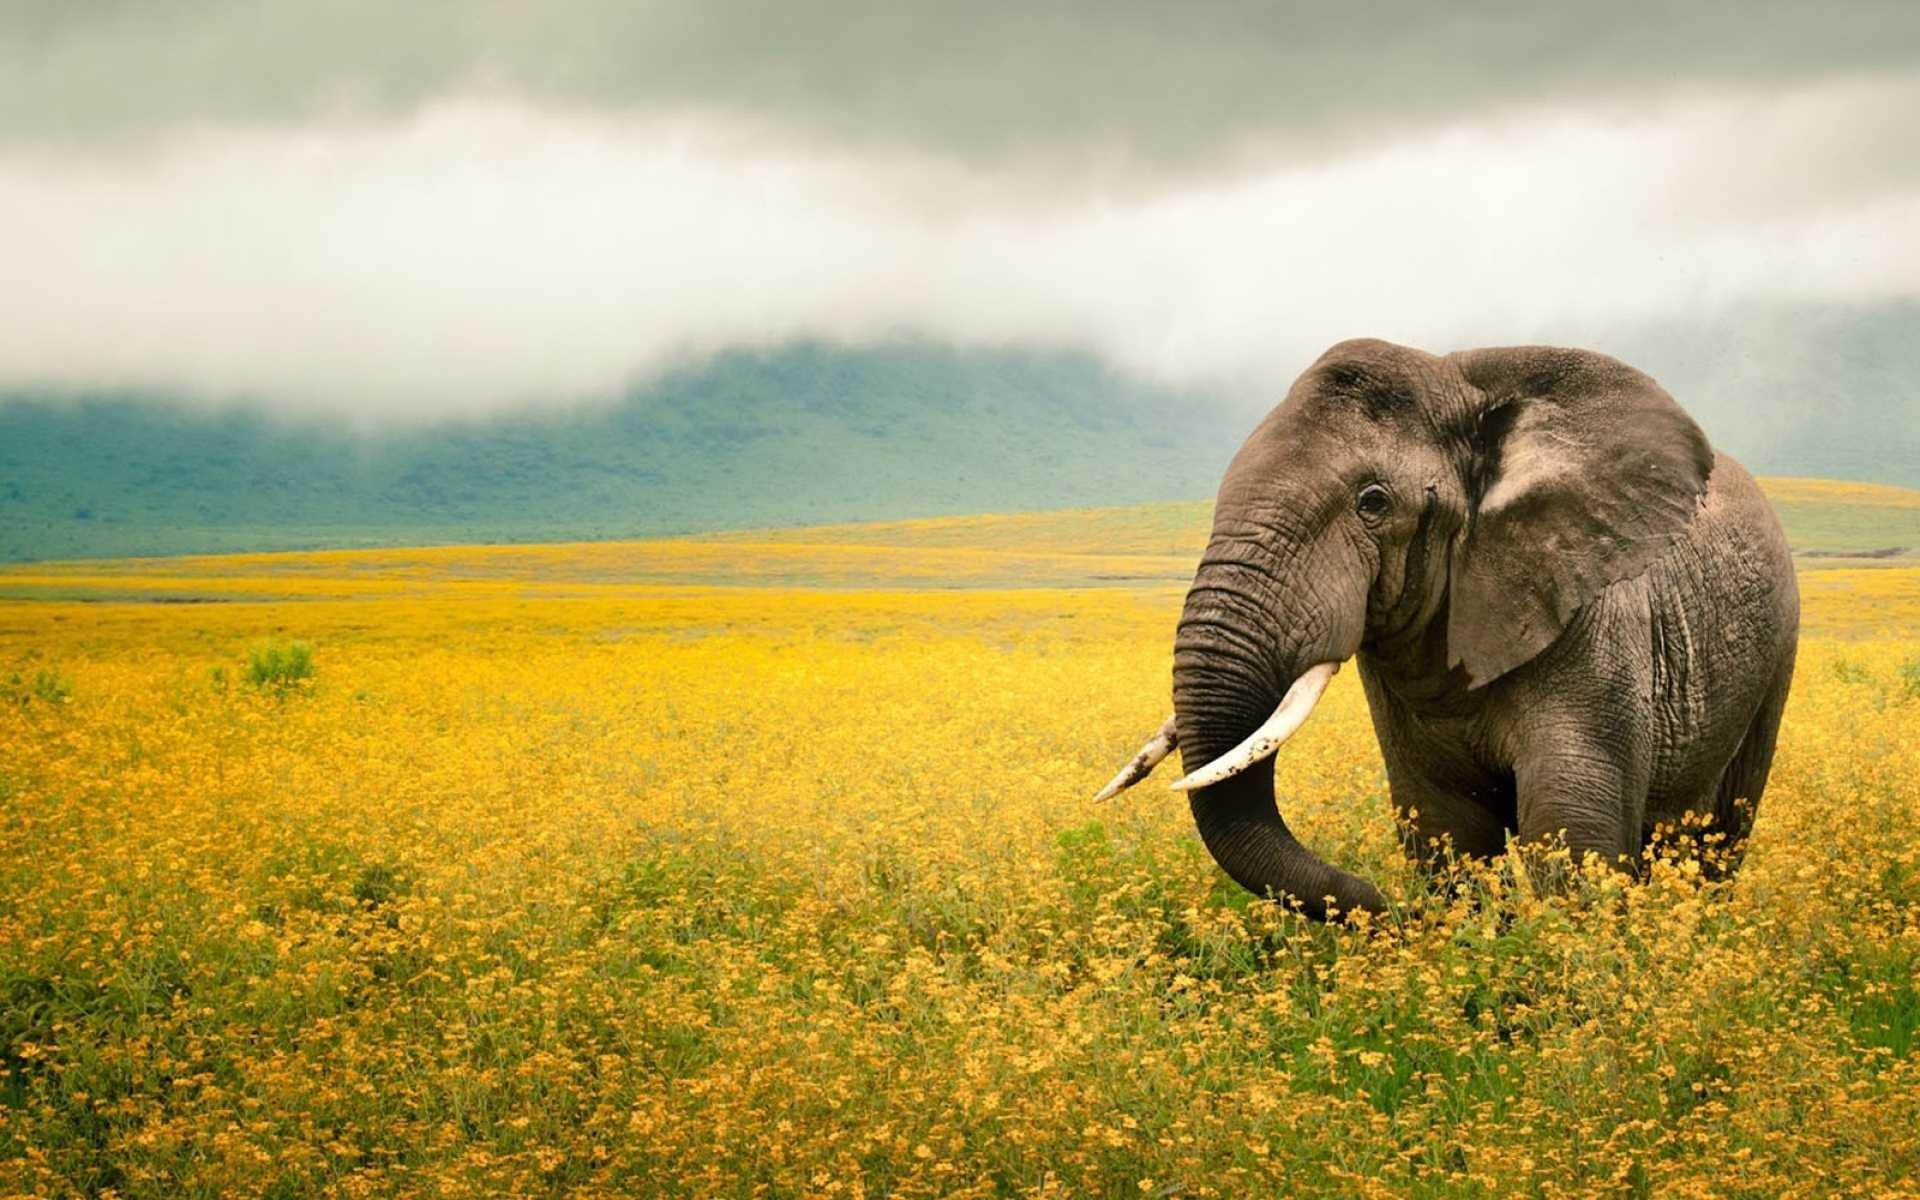 Most Inspiring Wallpaper Cartoon Elephant - 1153564-cool-elephant-iphone-wallpaper-1920x1200  Pictures_743418  .jpg